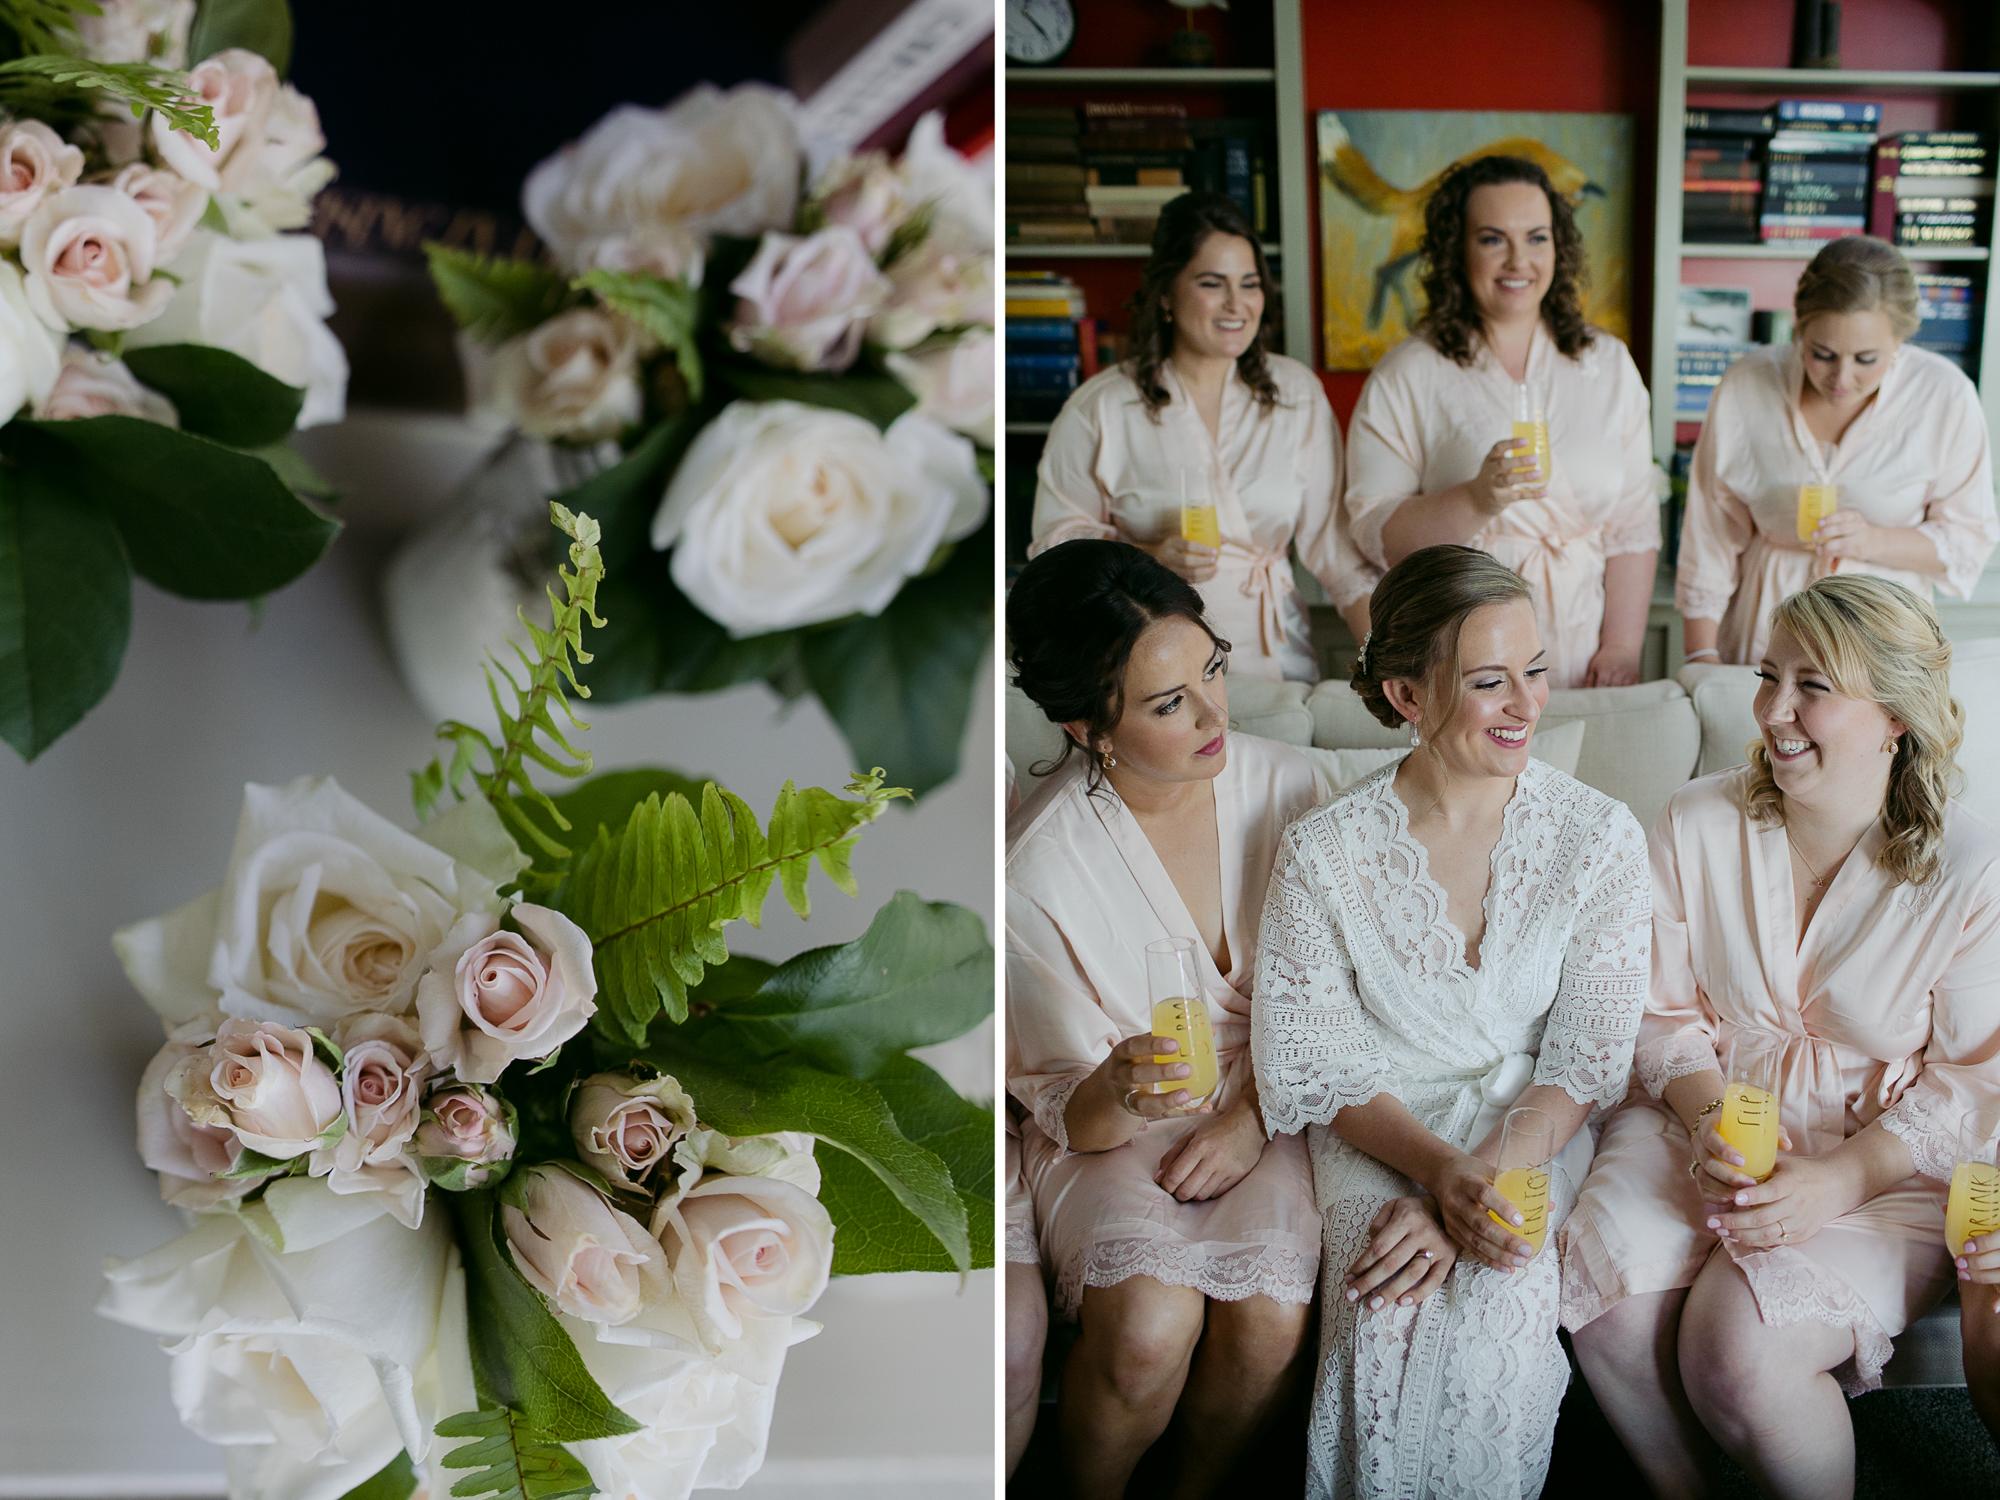 Livewell_Farm_wedding_Harpswell_maine_Meghan_Jim_004.jpg